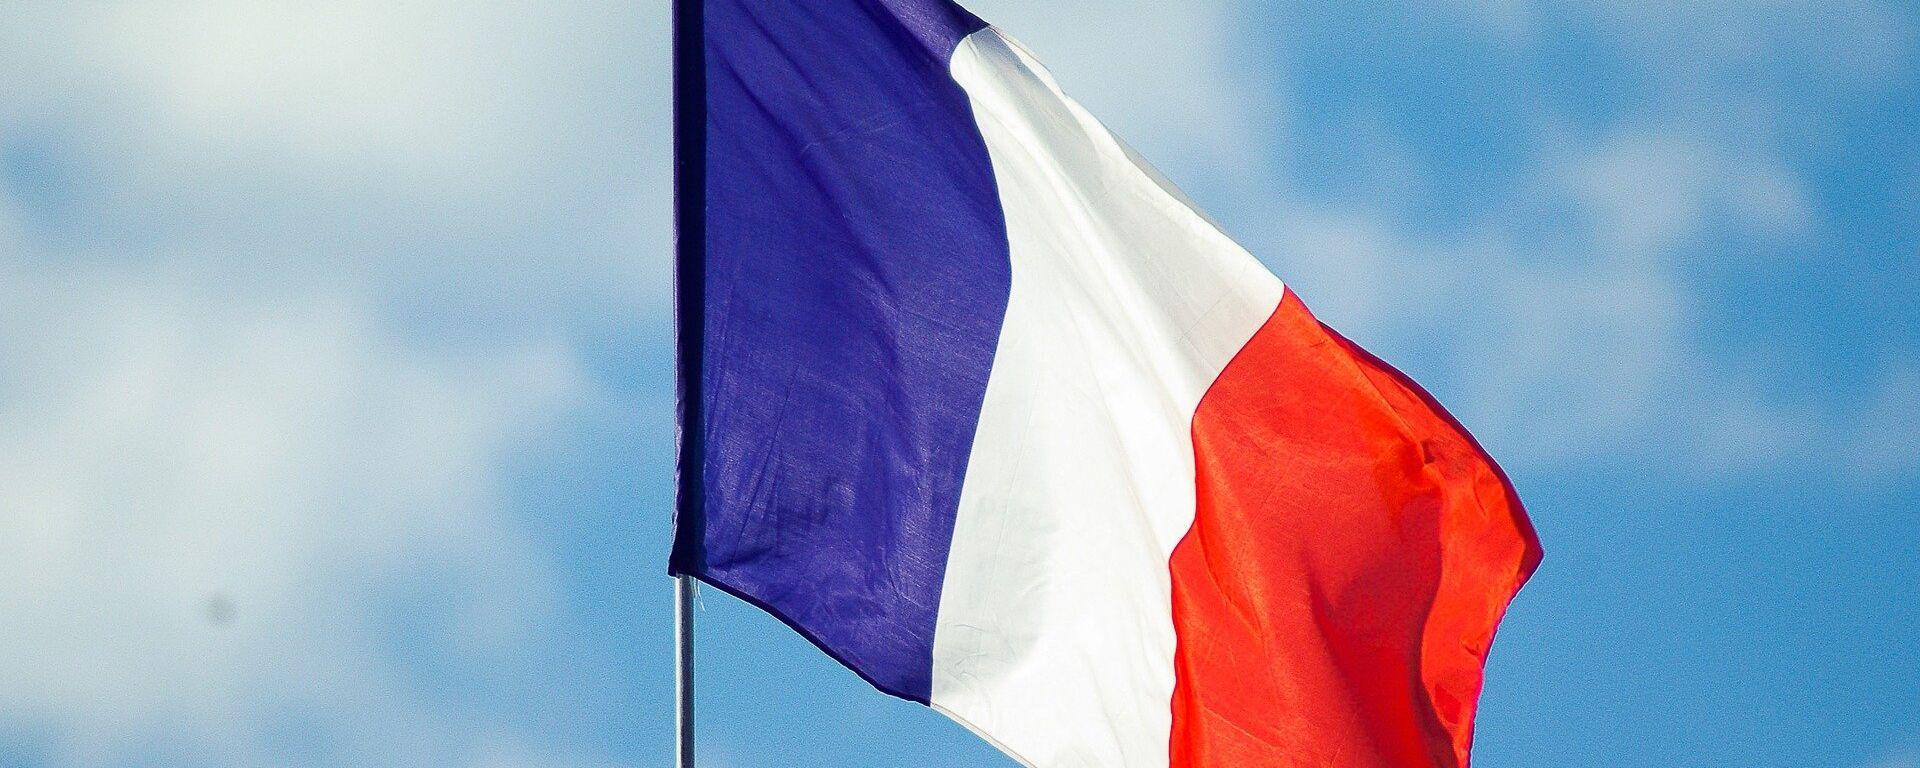 Bandera de Francia - Sputnik Mundo, 1920, 11.02.2021